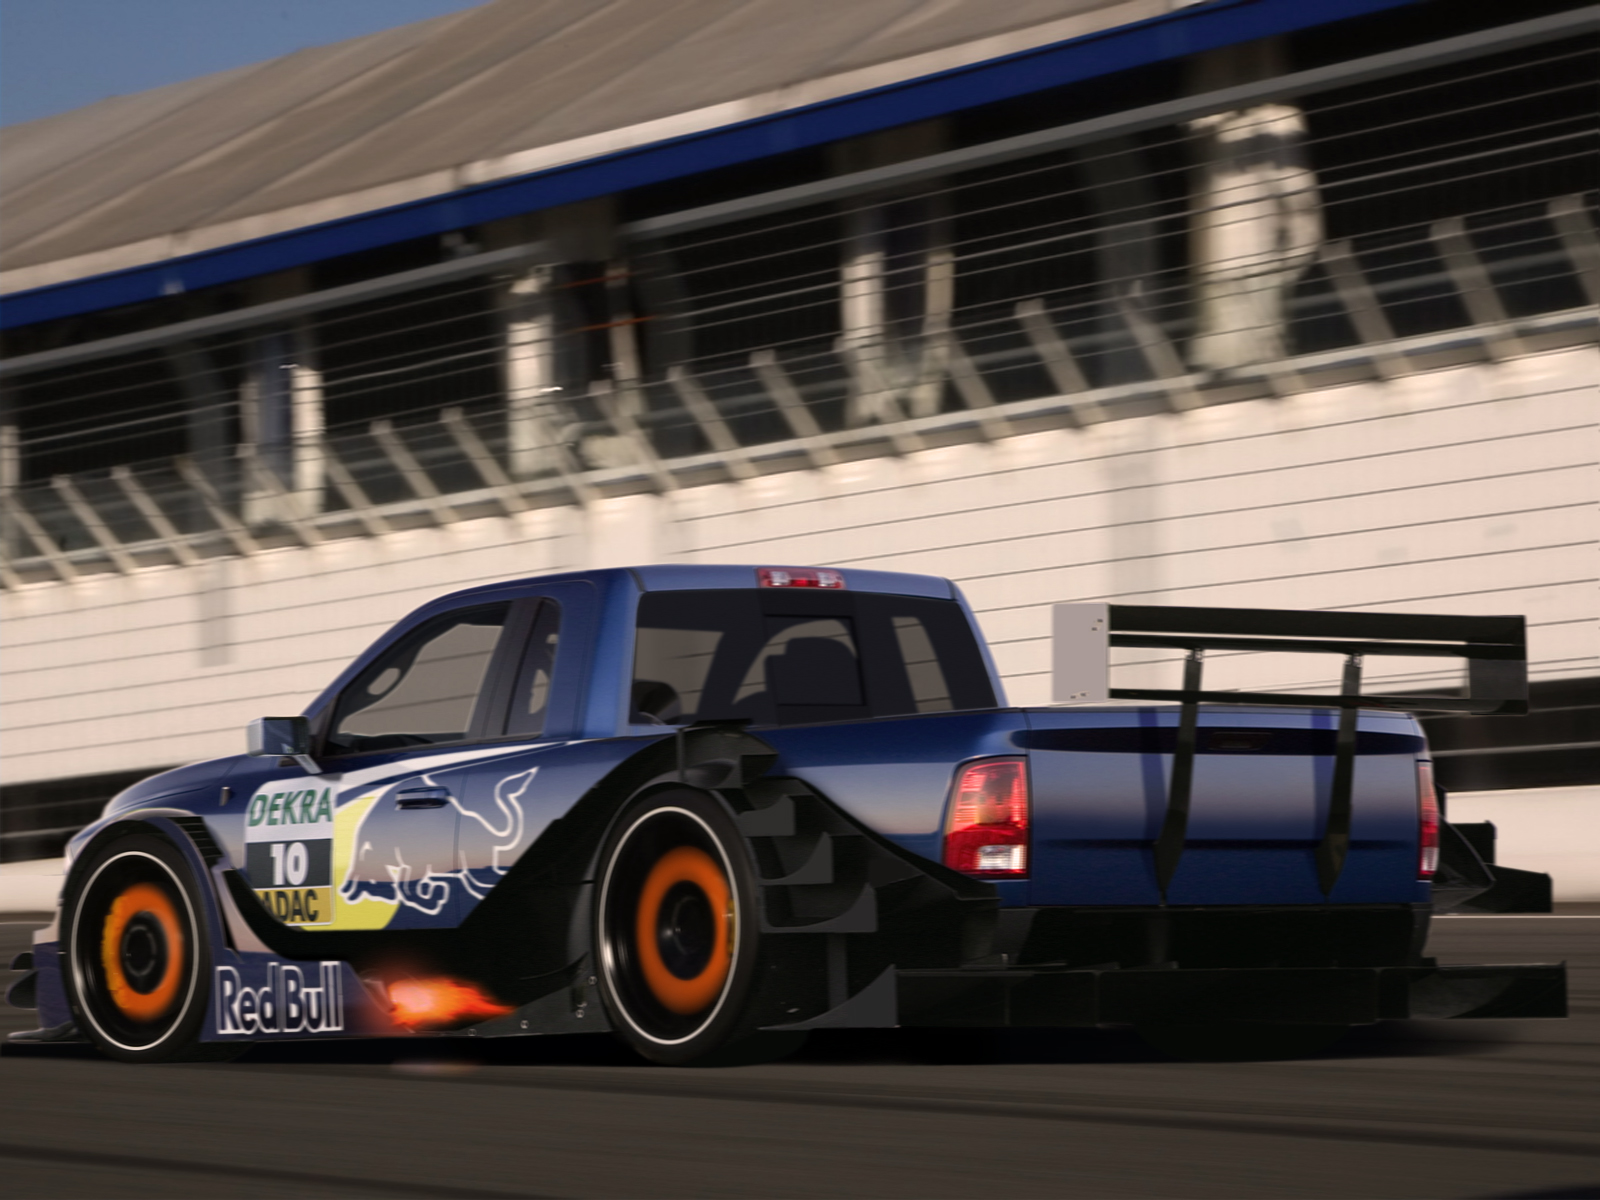 Dodge Ram Racing By Degraafm On Deviantart